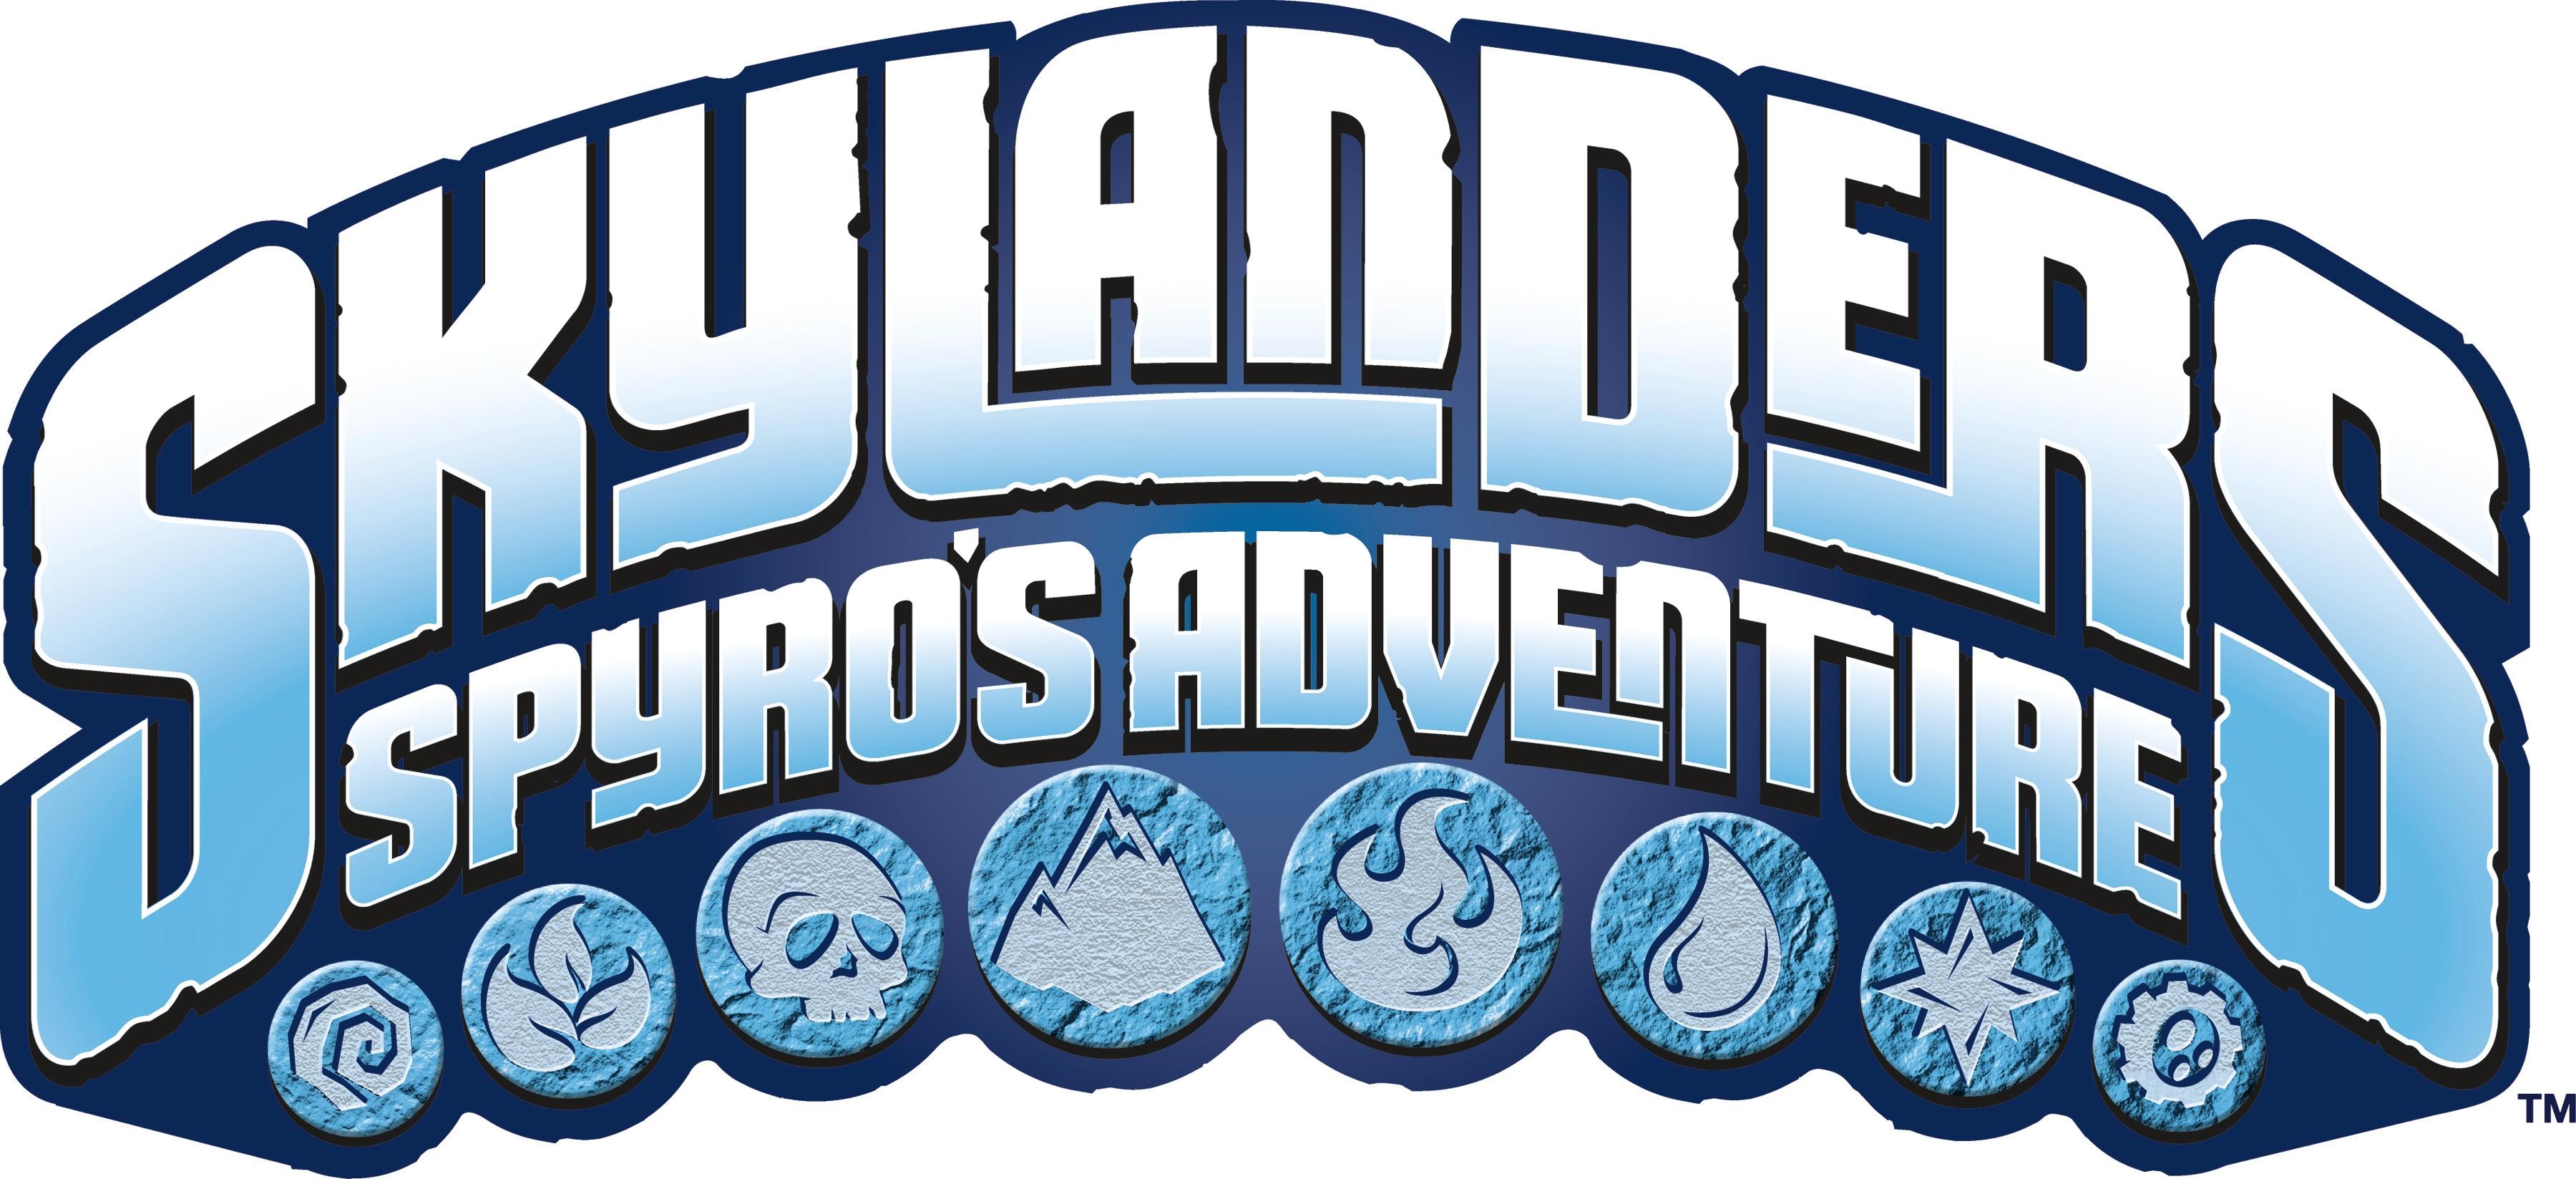 Skylander Spyro's adventure